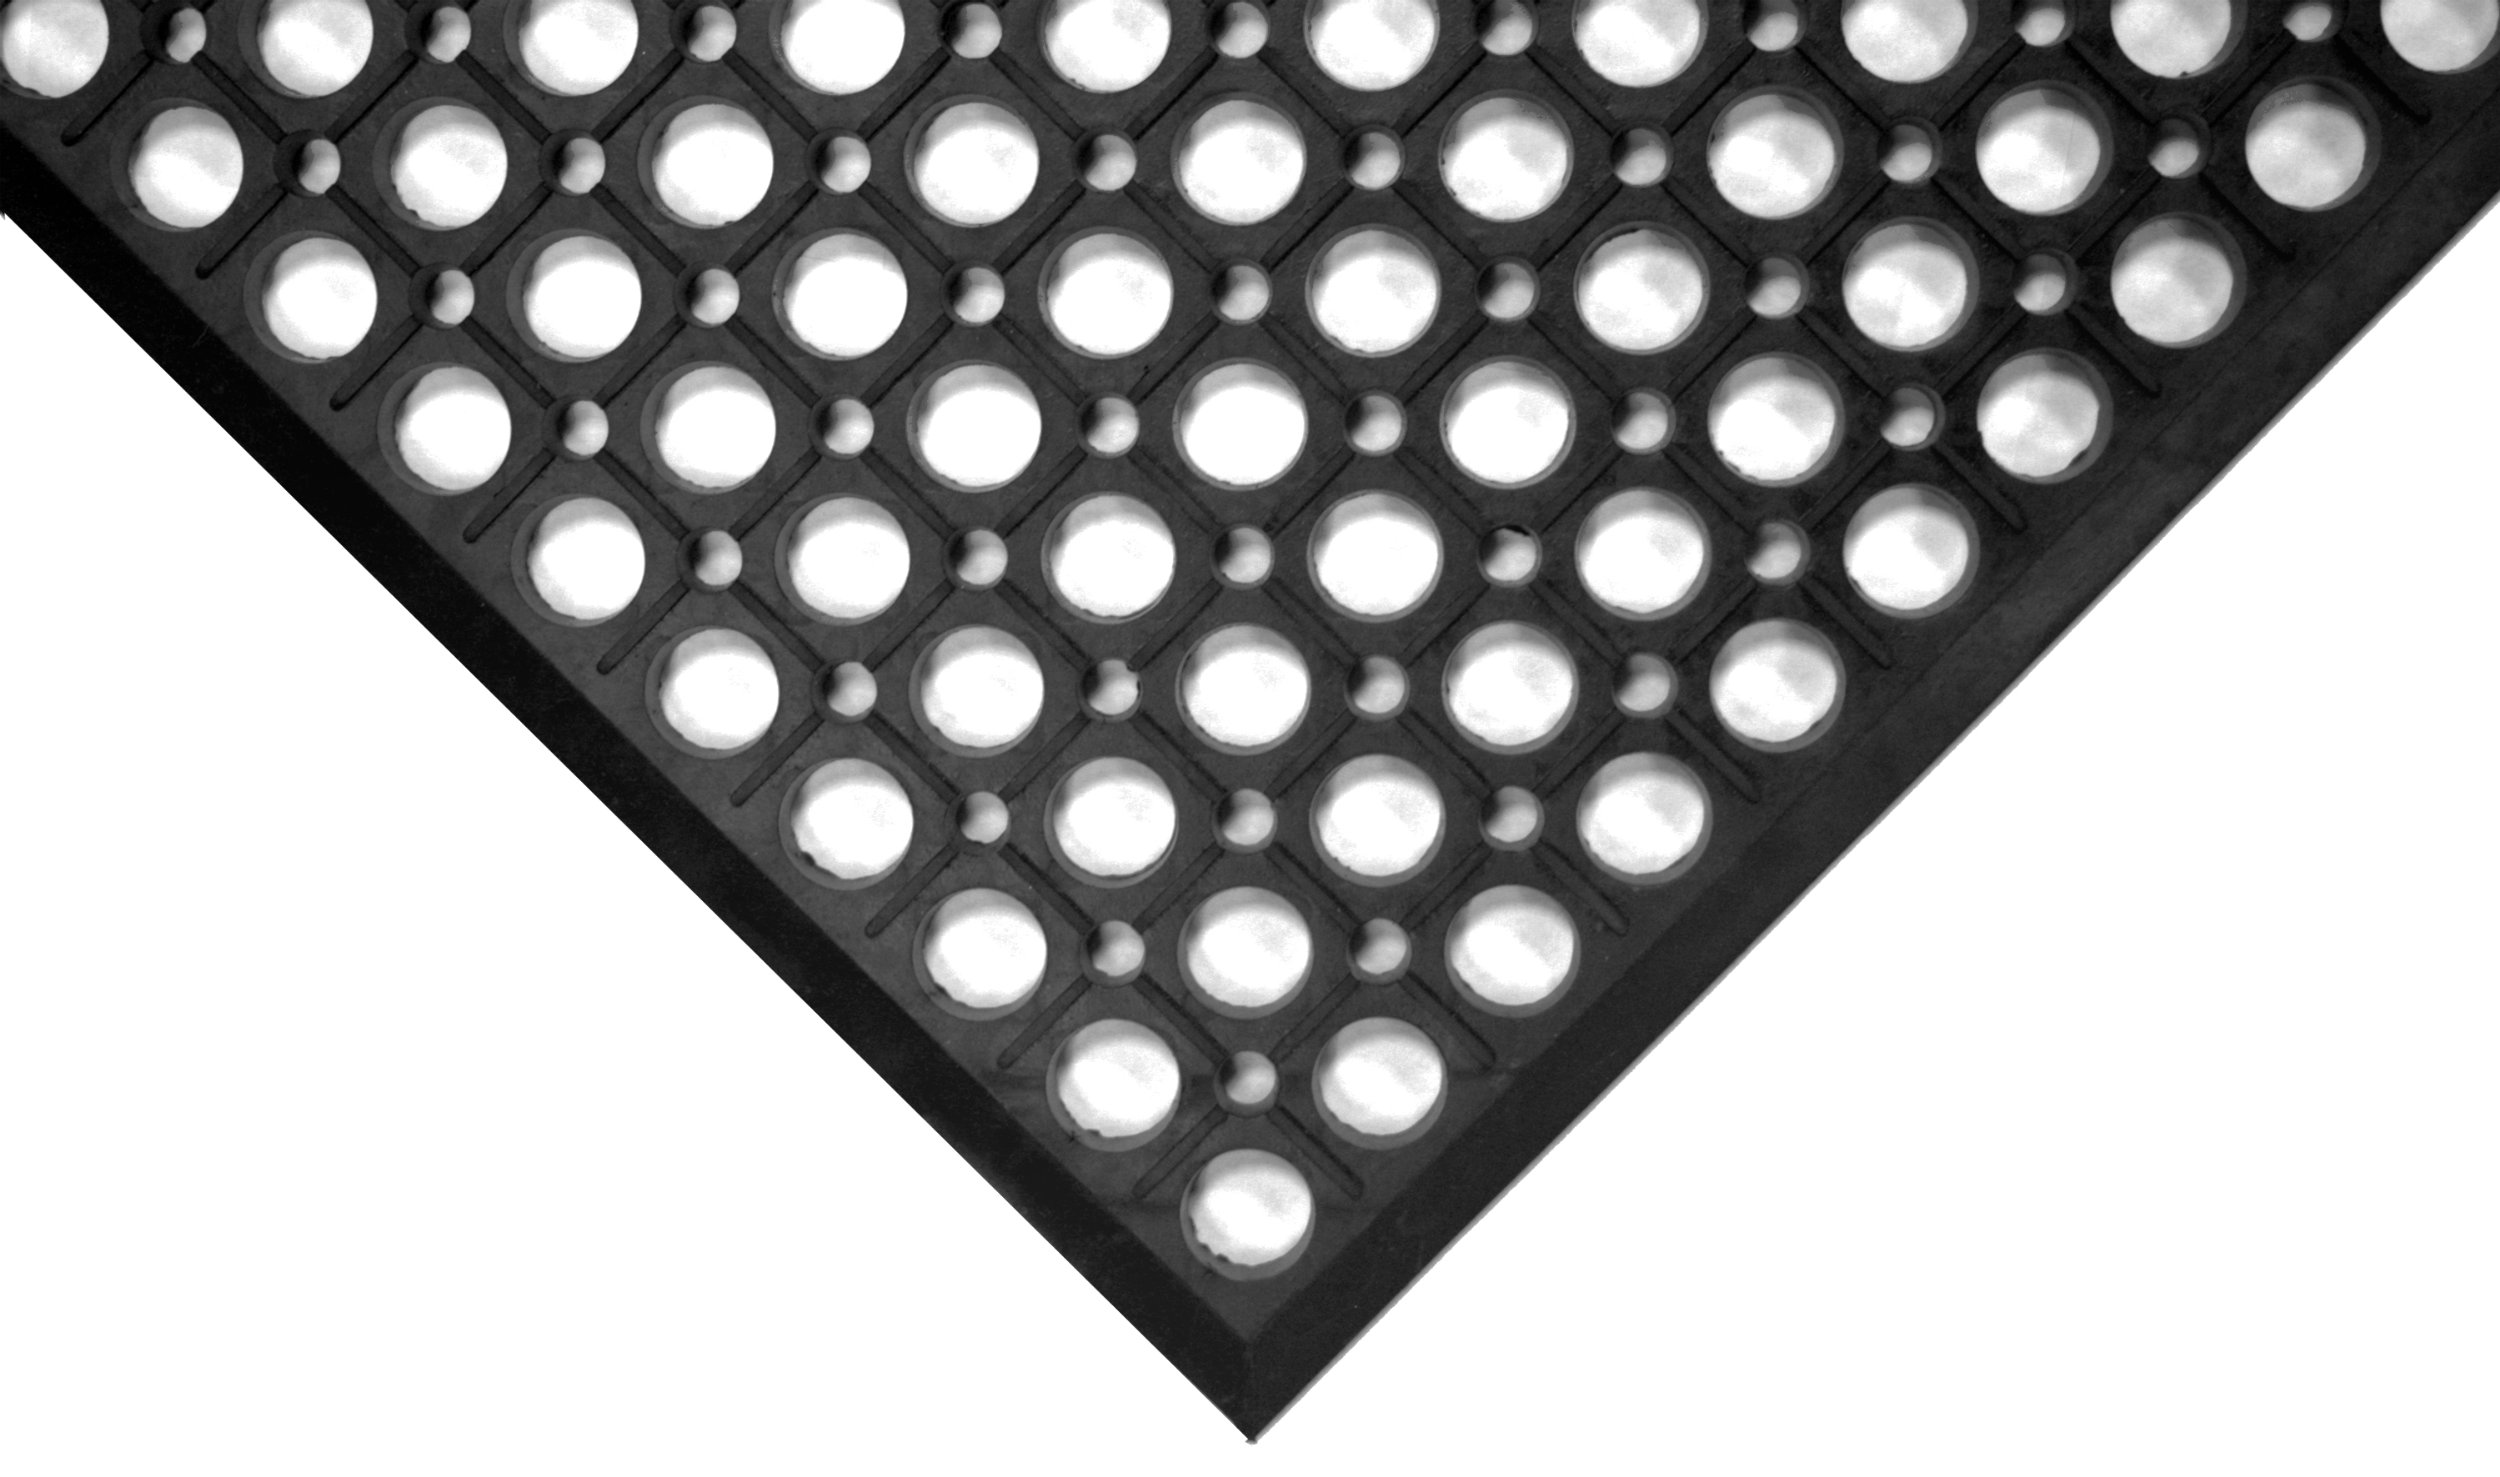 Wearwell 474.12x3x5BK WorkRite Beveled Mat, Black, 1/2-Inch by 3-Feet by 5-Feet